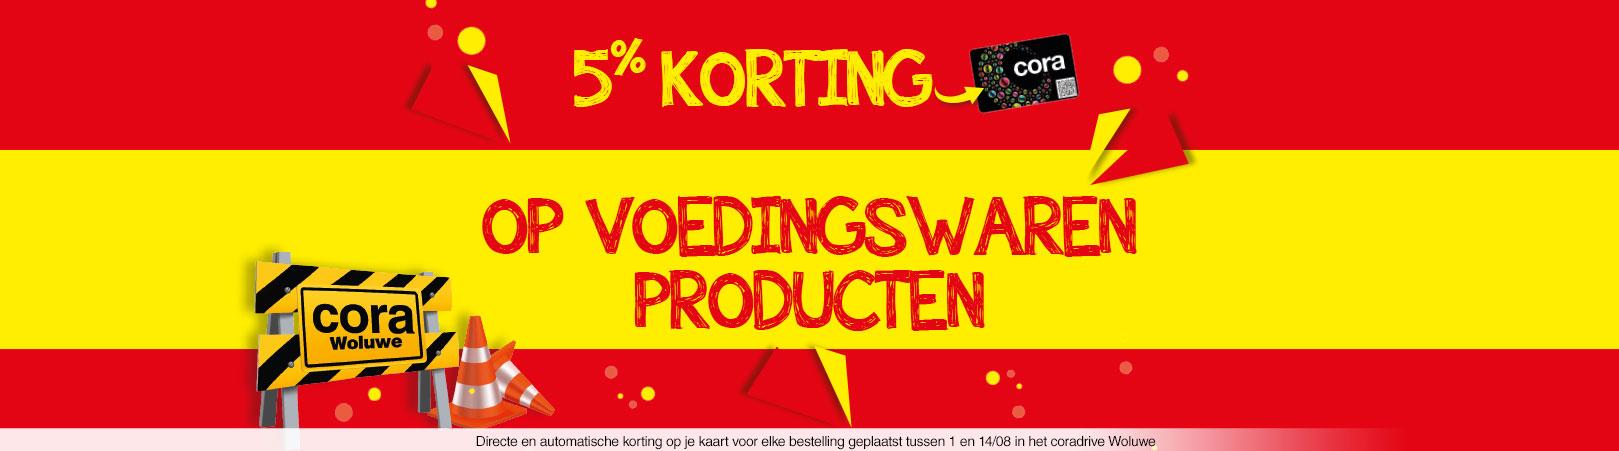 5% korting